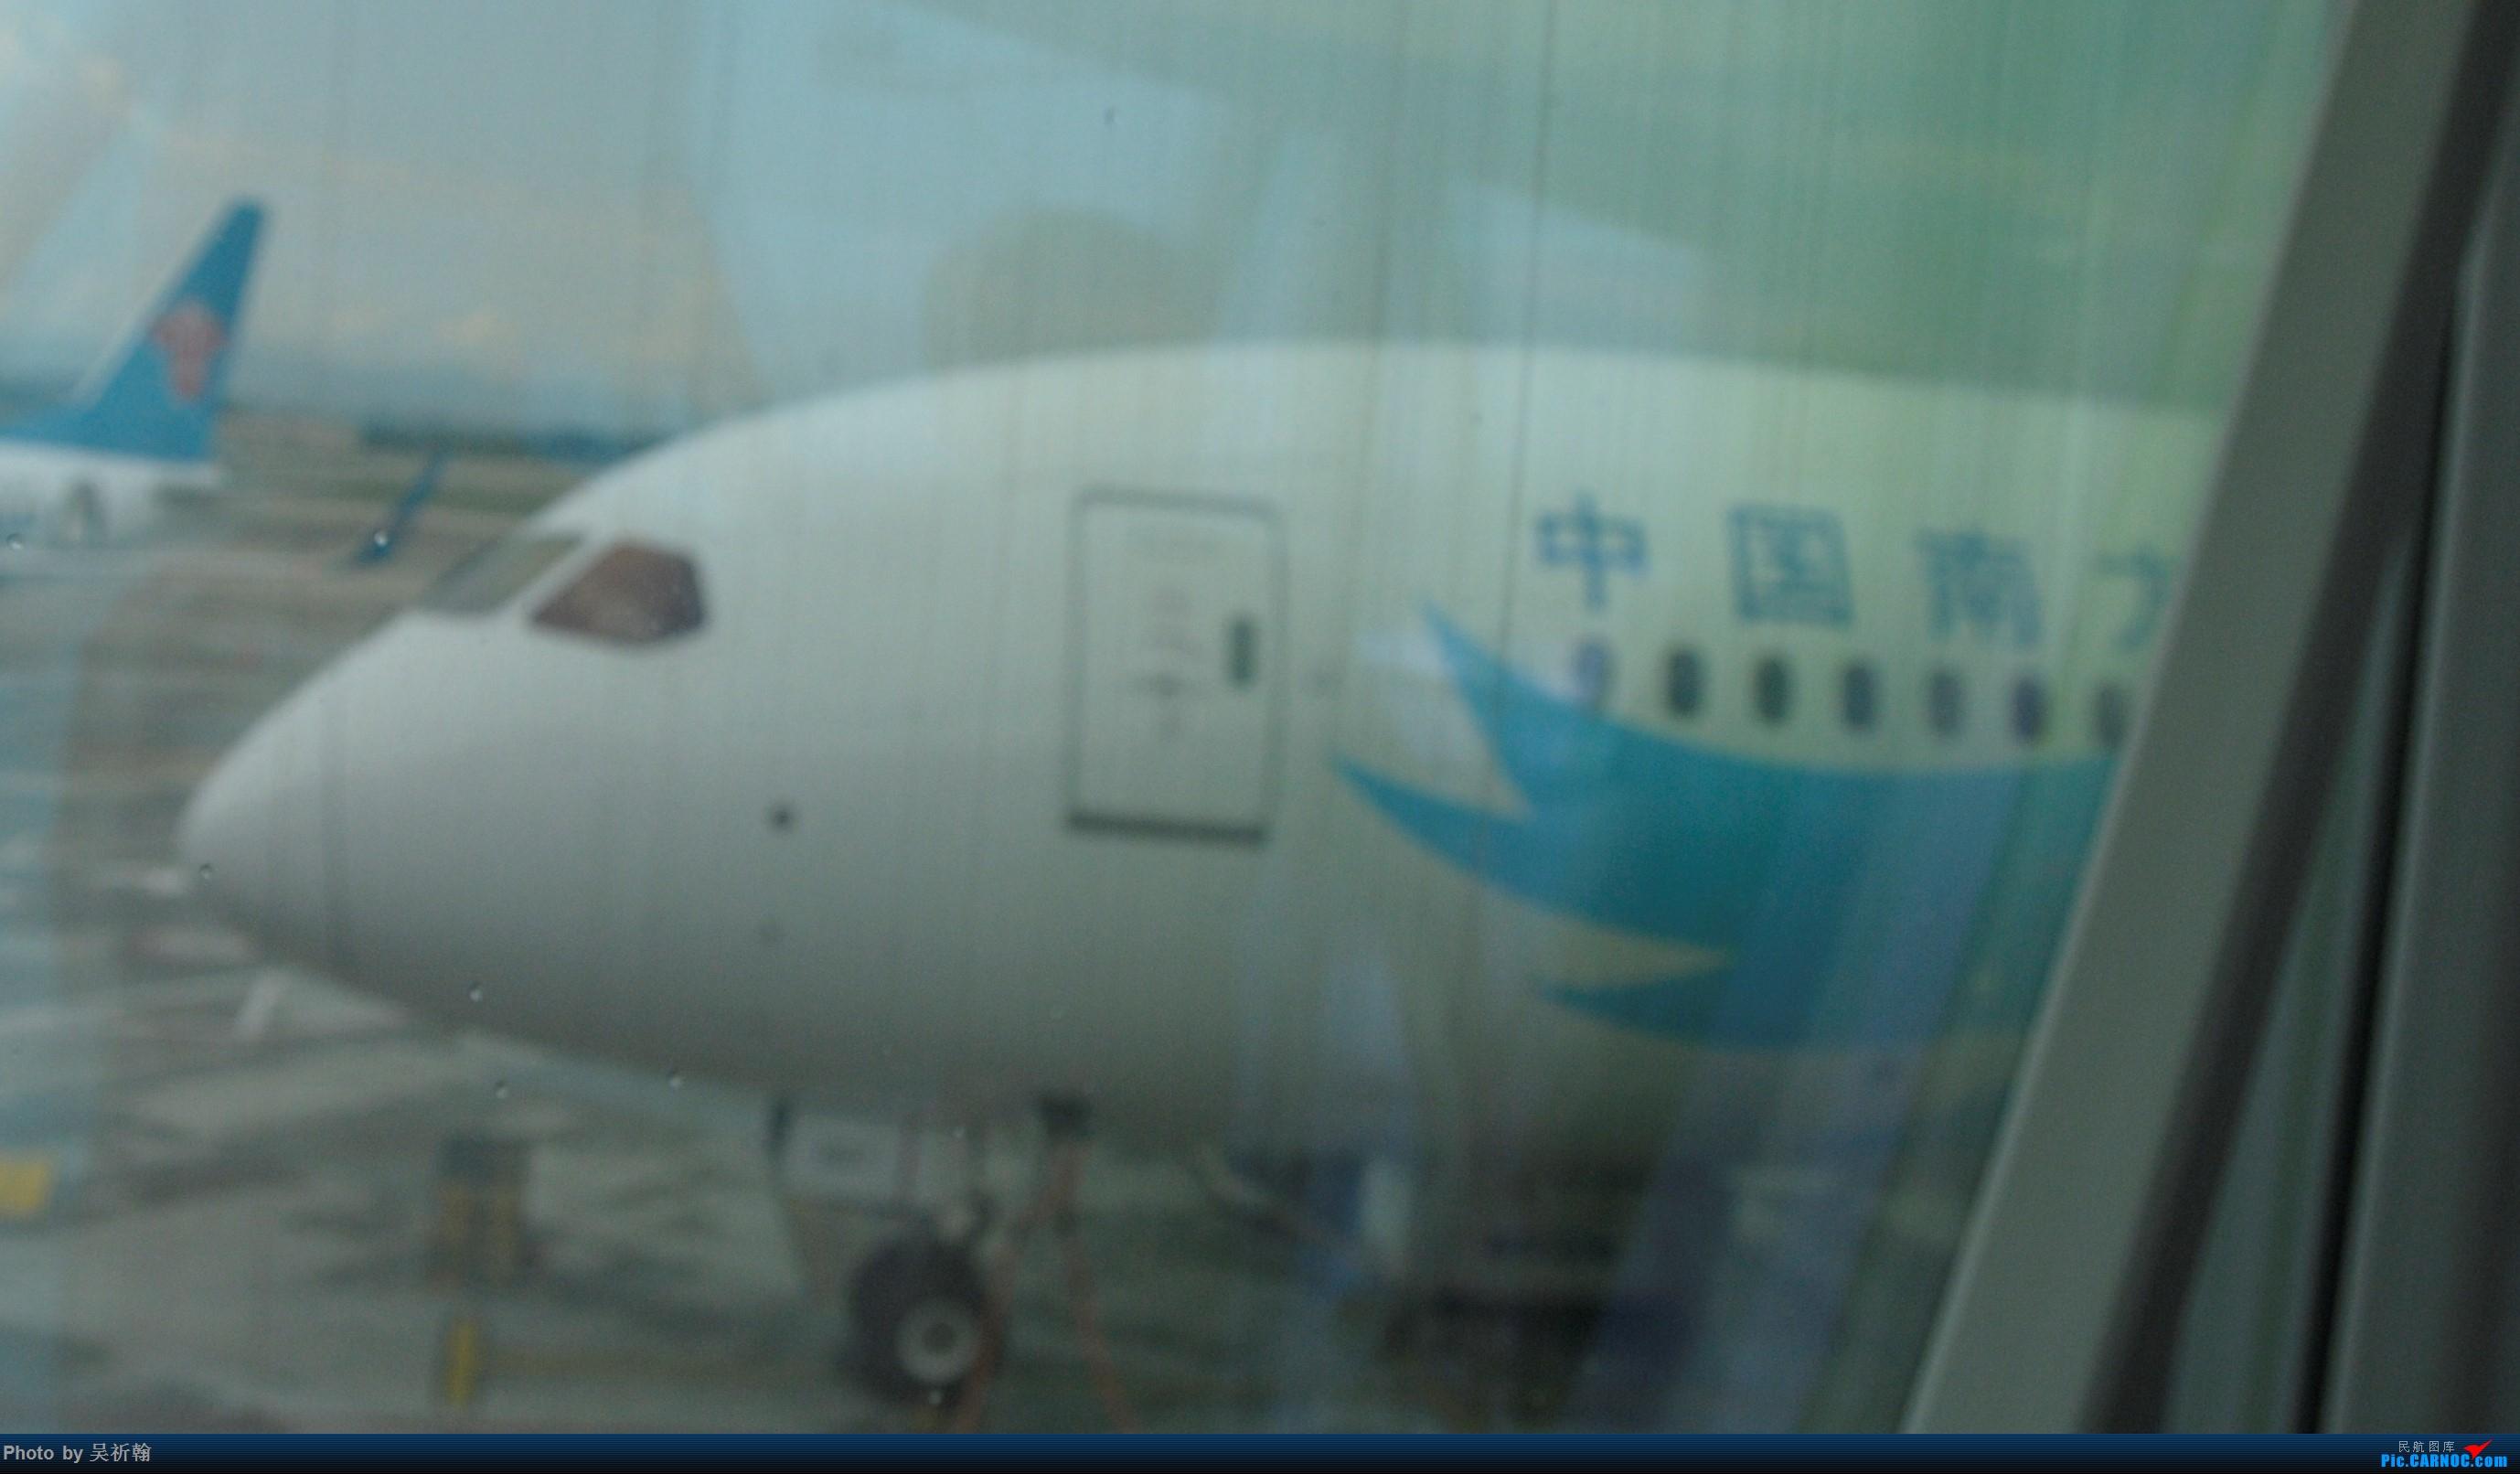 Re:[原创]Kian的飞行游记2:金陵2日游,B787返回广州 BOEING 787-9 B-20D7